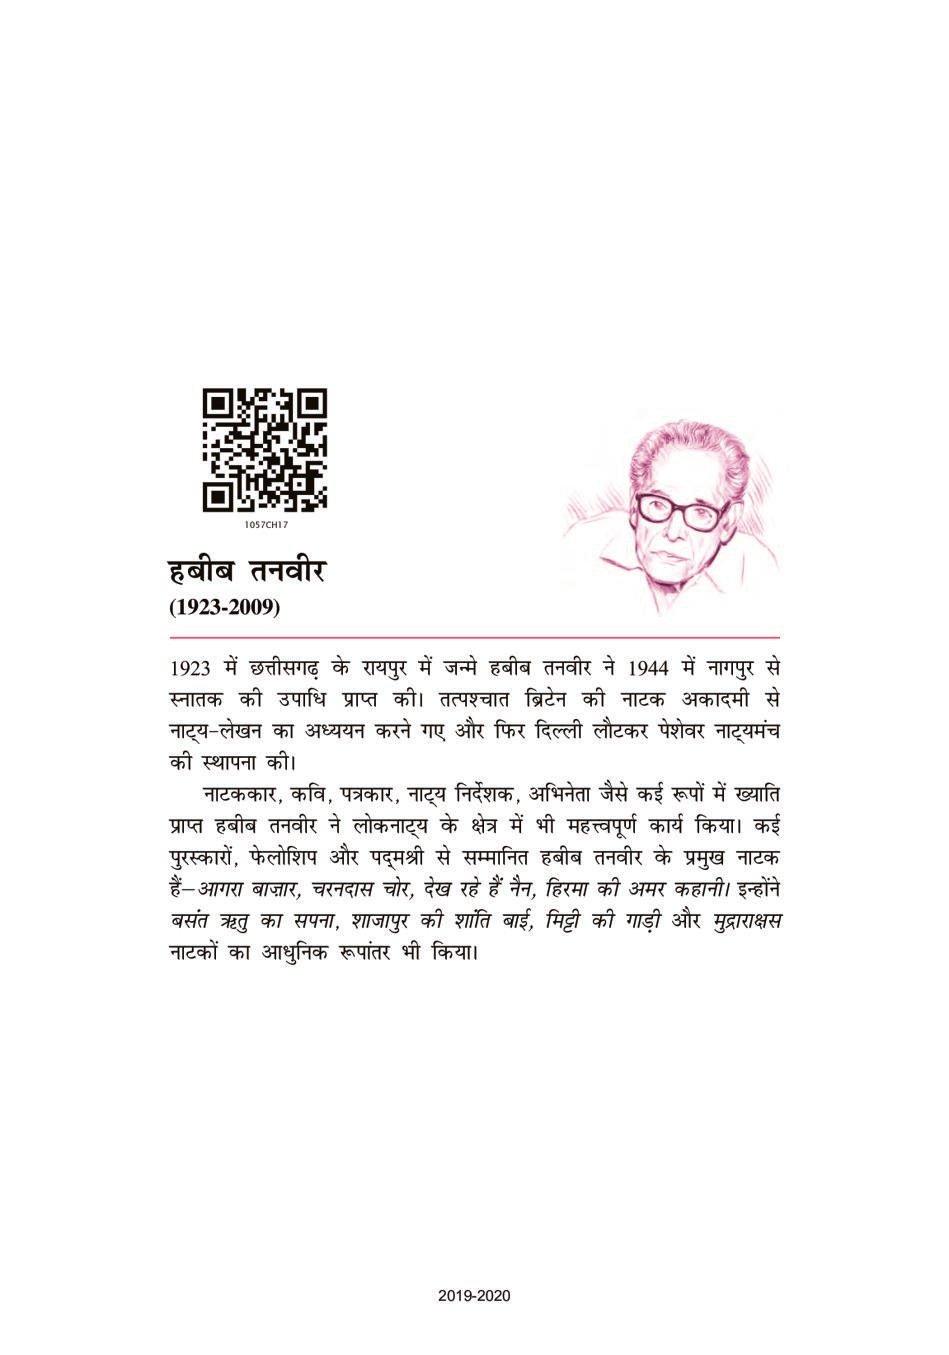 NCERT Book Class 10 Hindi (स्पर्श) Chapter 17 कारतूस - Page 1